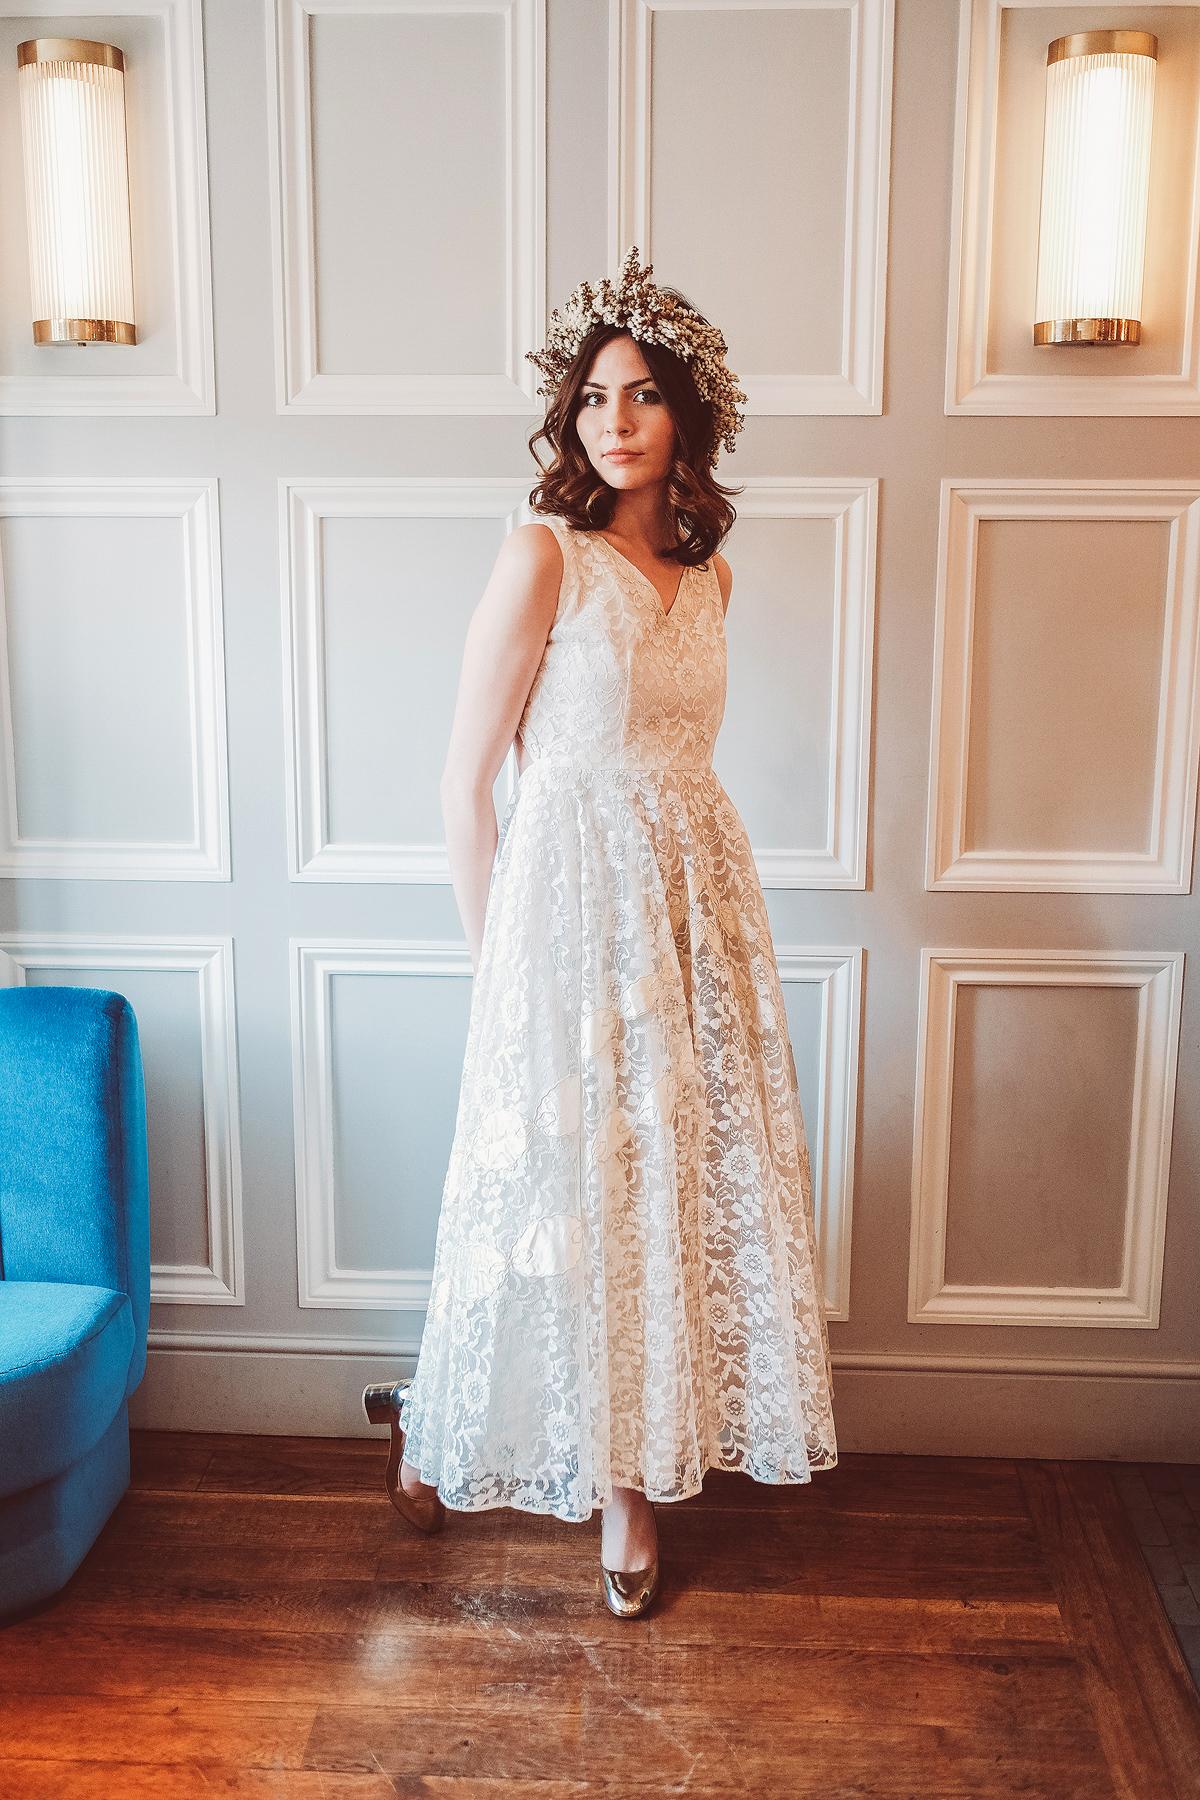 Beautiful Vintage Wedding Dresses & Bridal Fashion From